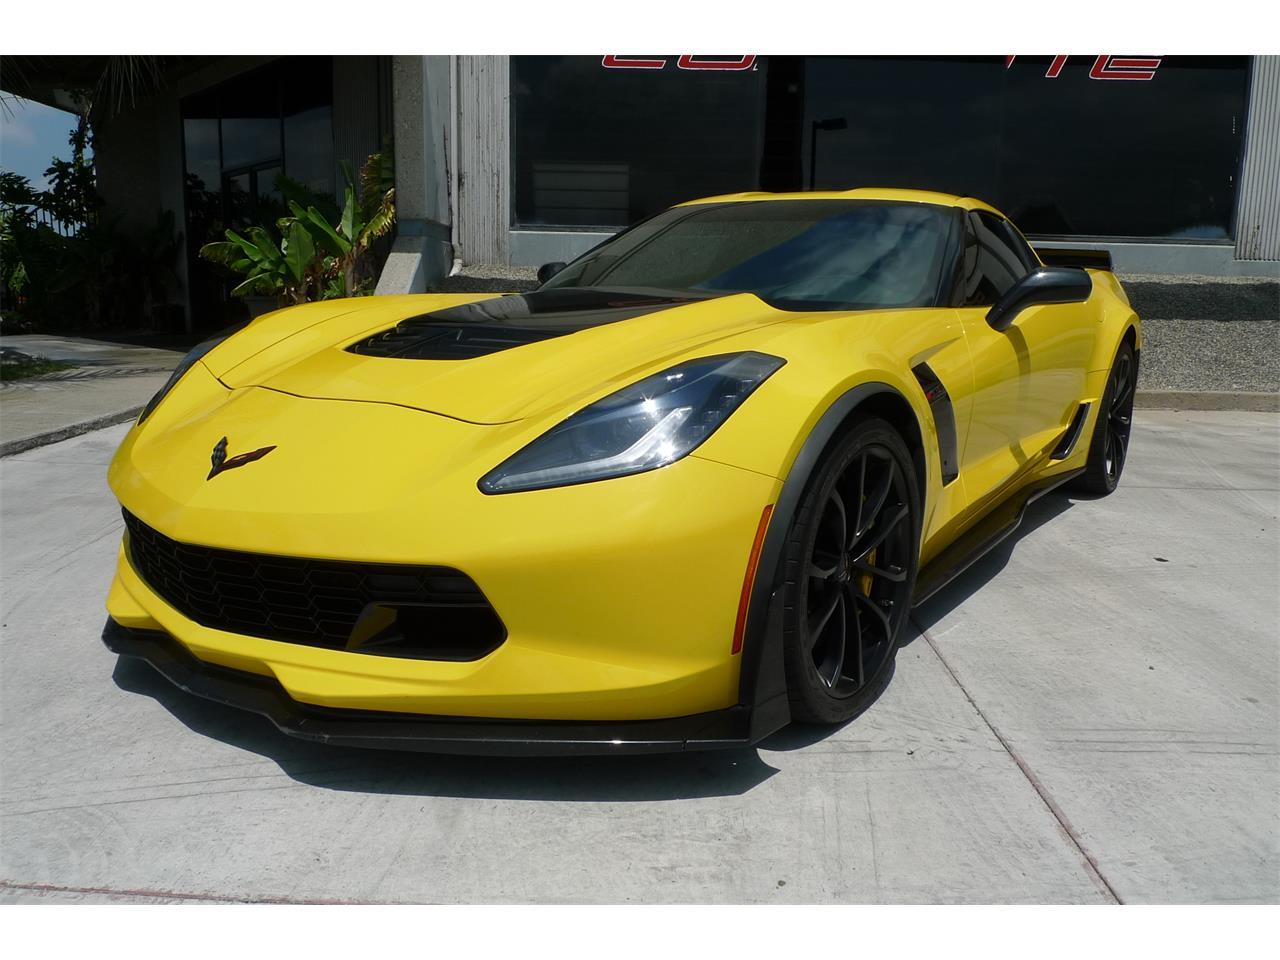 z06 corvette chevrolet anaheim california classic cc classiccars financing inspection insurance transport